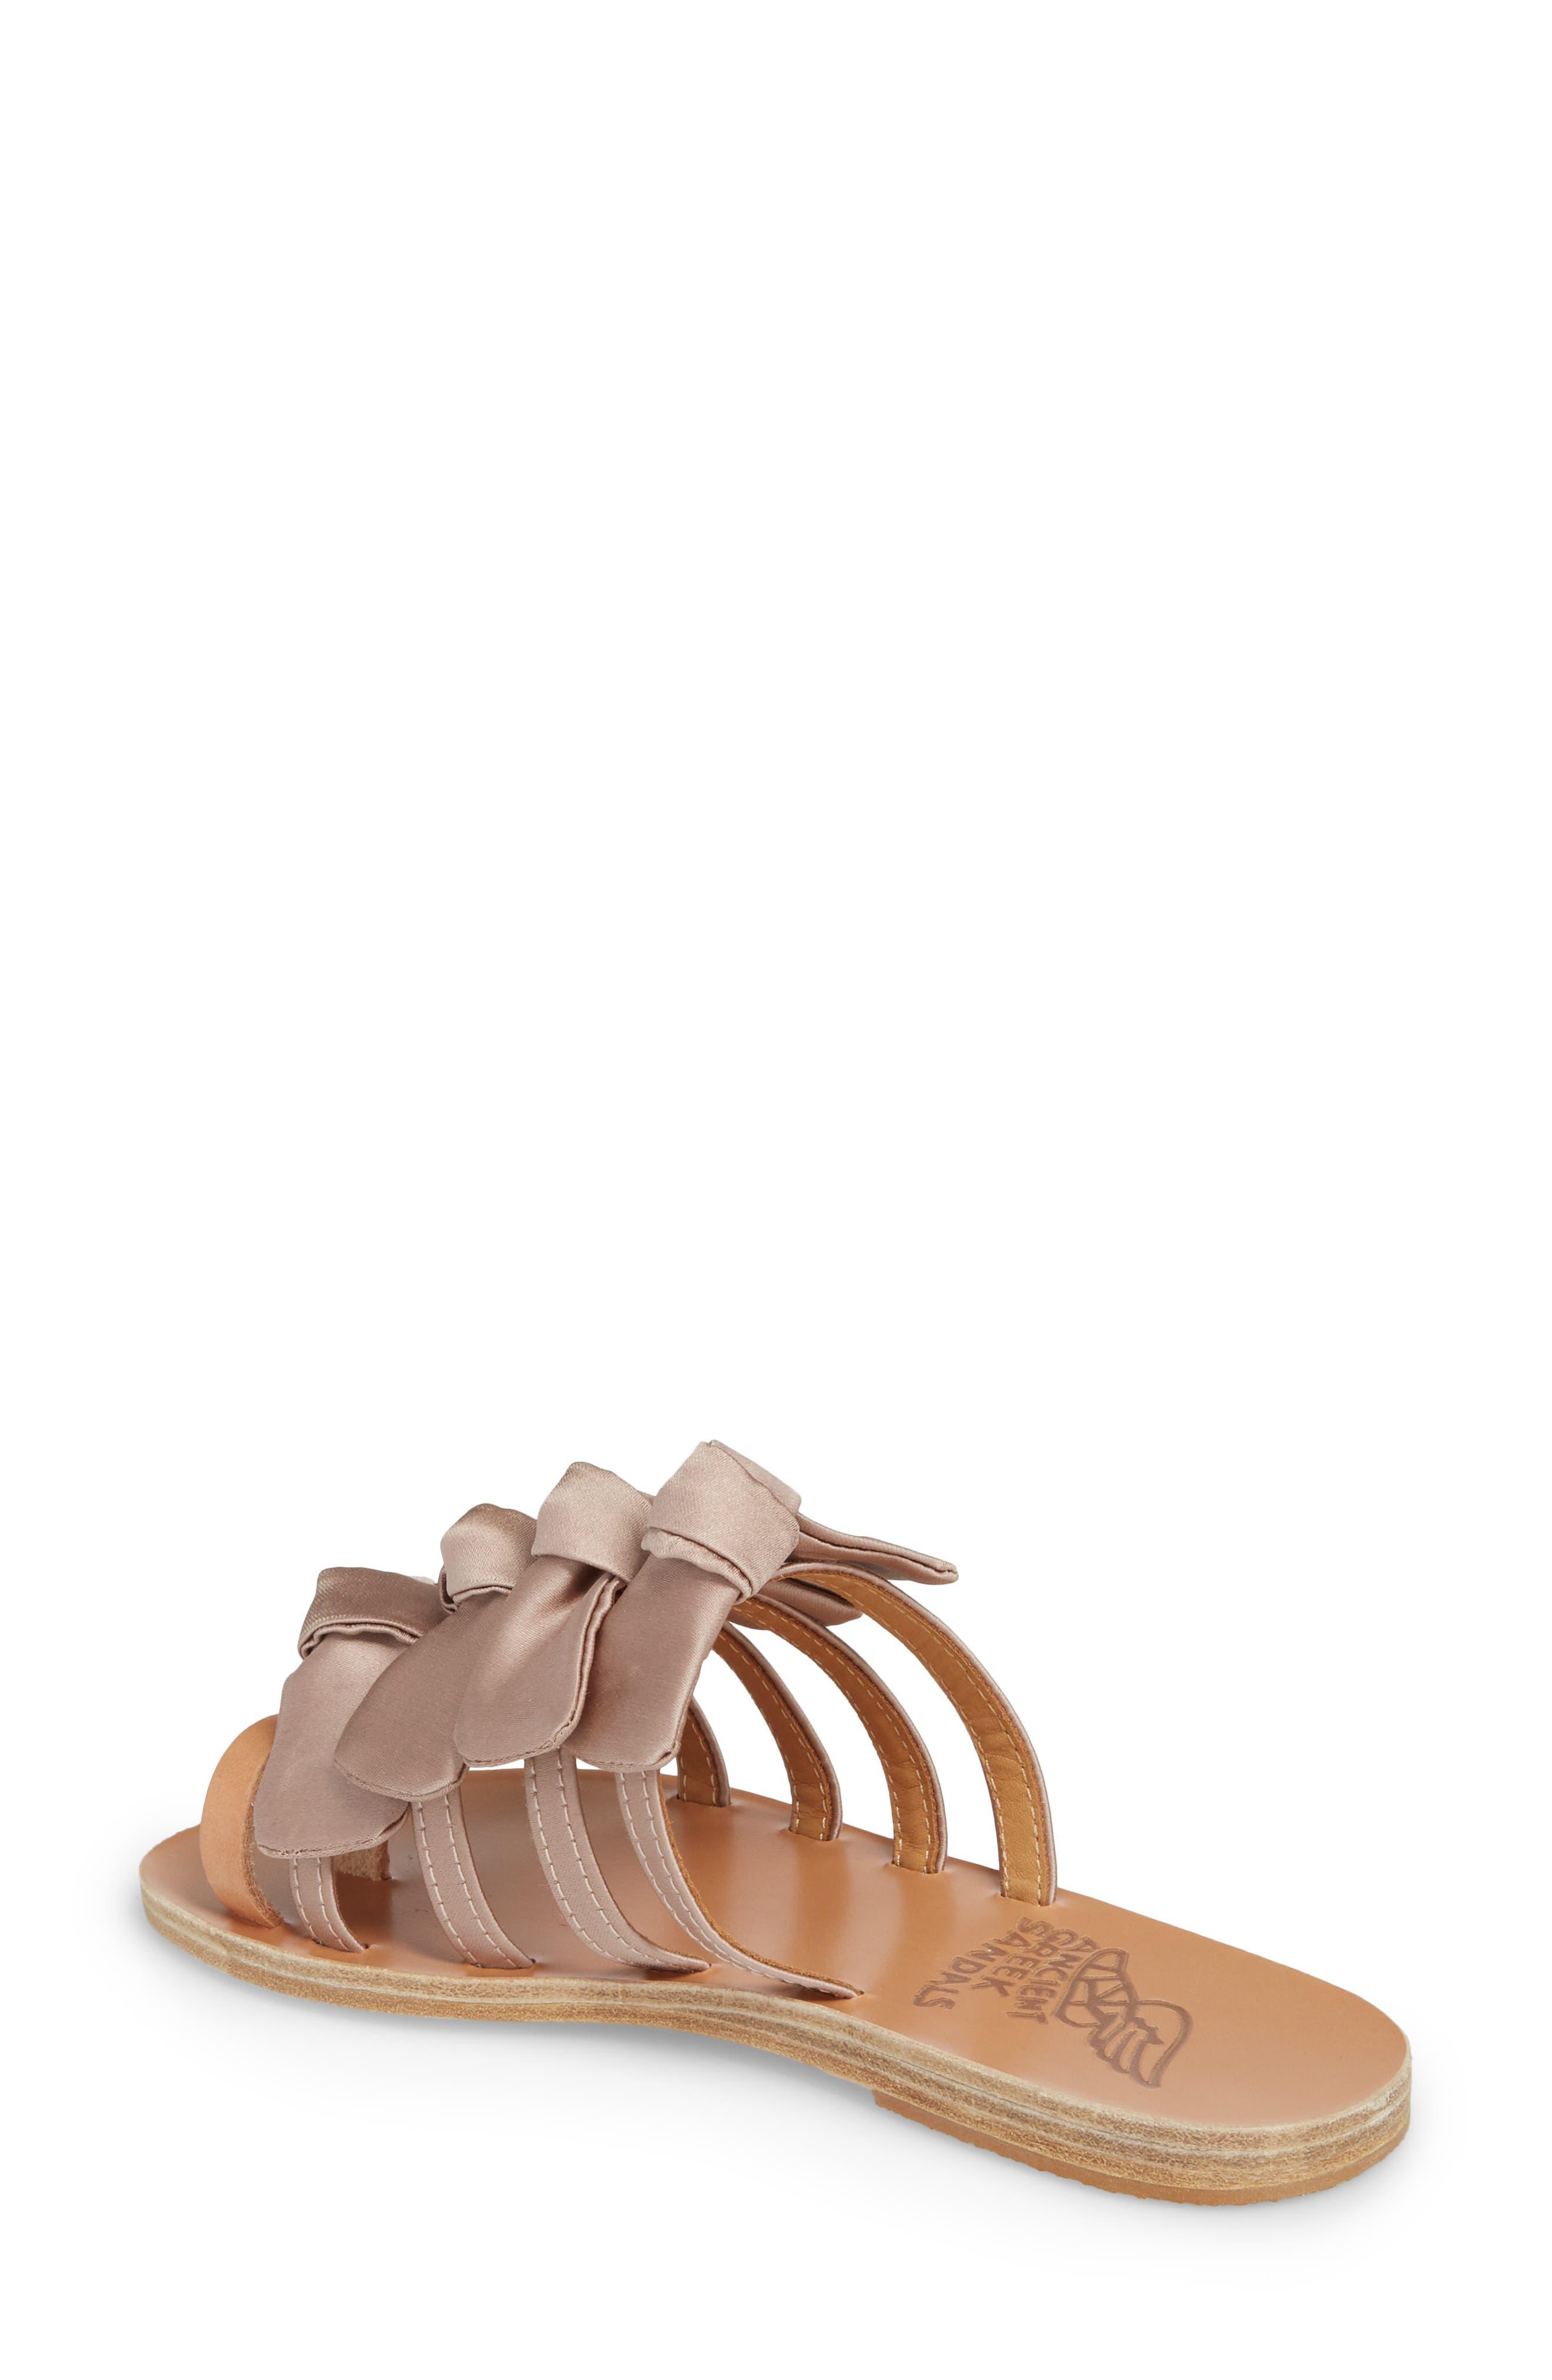 Hara Toe Loop Slide Sandal,                             Alternate thumbnail 2, color,                             650